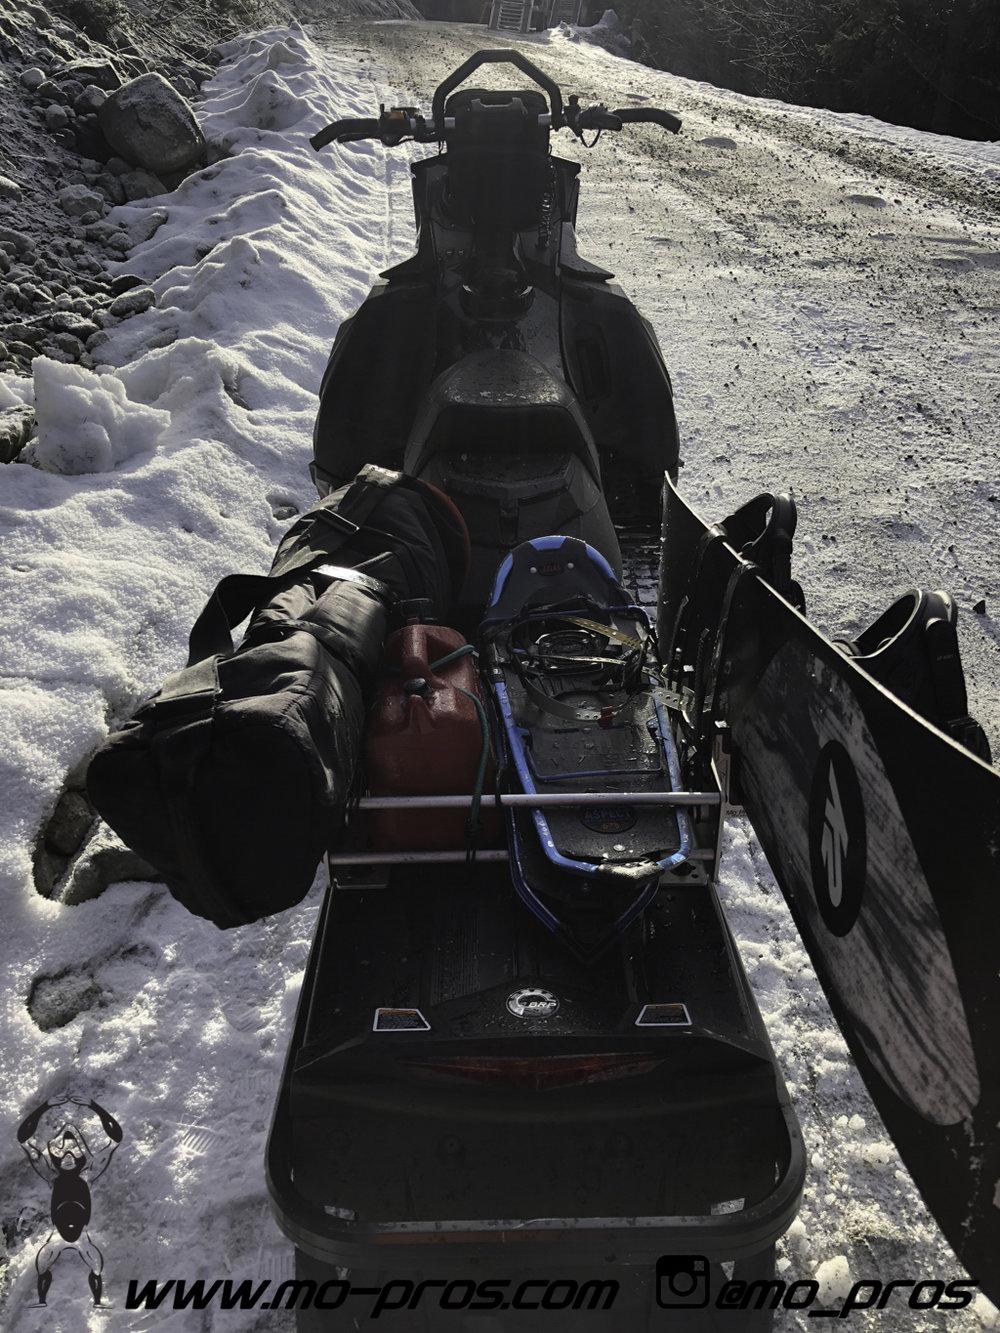 77_snowmobile bag_Snowmobile_timbersled bag_gas Rack_Gear_Gun Rack_LinQ Snowboard Ski_Ski_Snowbike_Timbersled Rack_Tsaina Rack_CFR rack_Cheetah Factory Racing_Snowboard rack_snowboard_Snowboarding_Ti.jpg